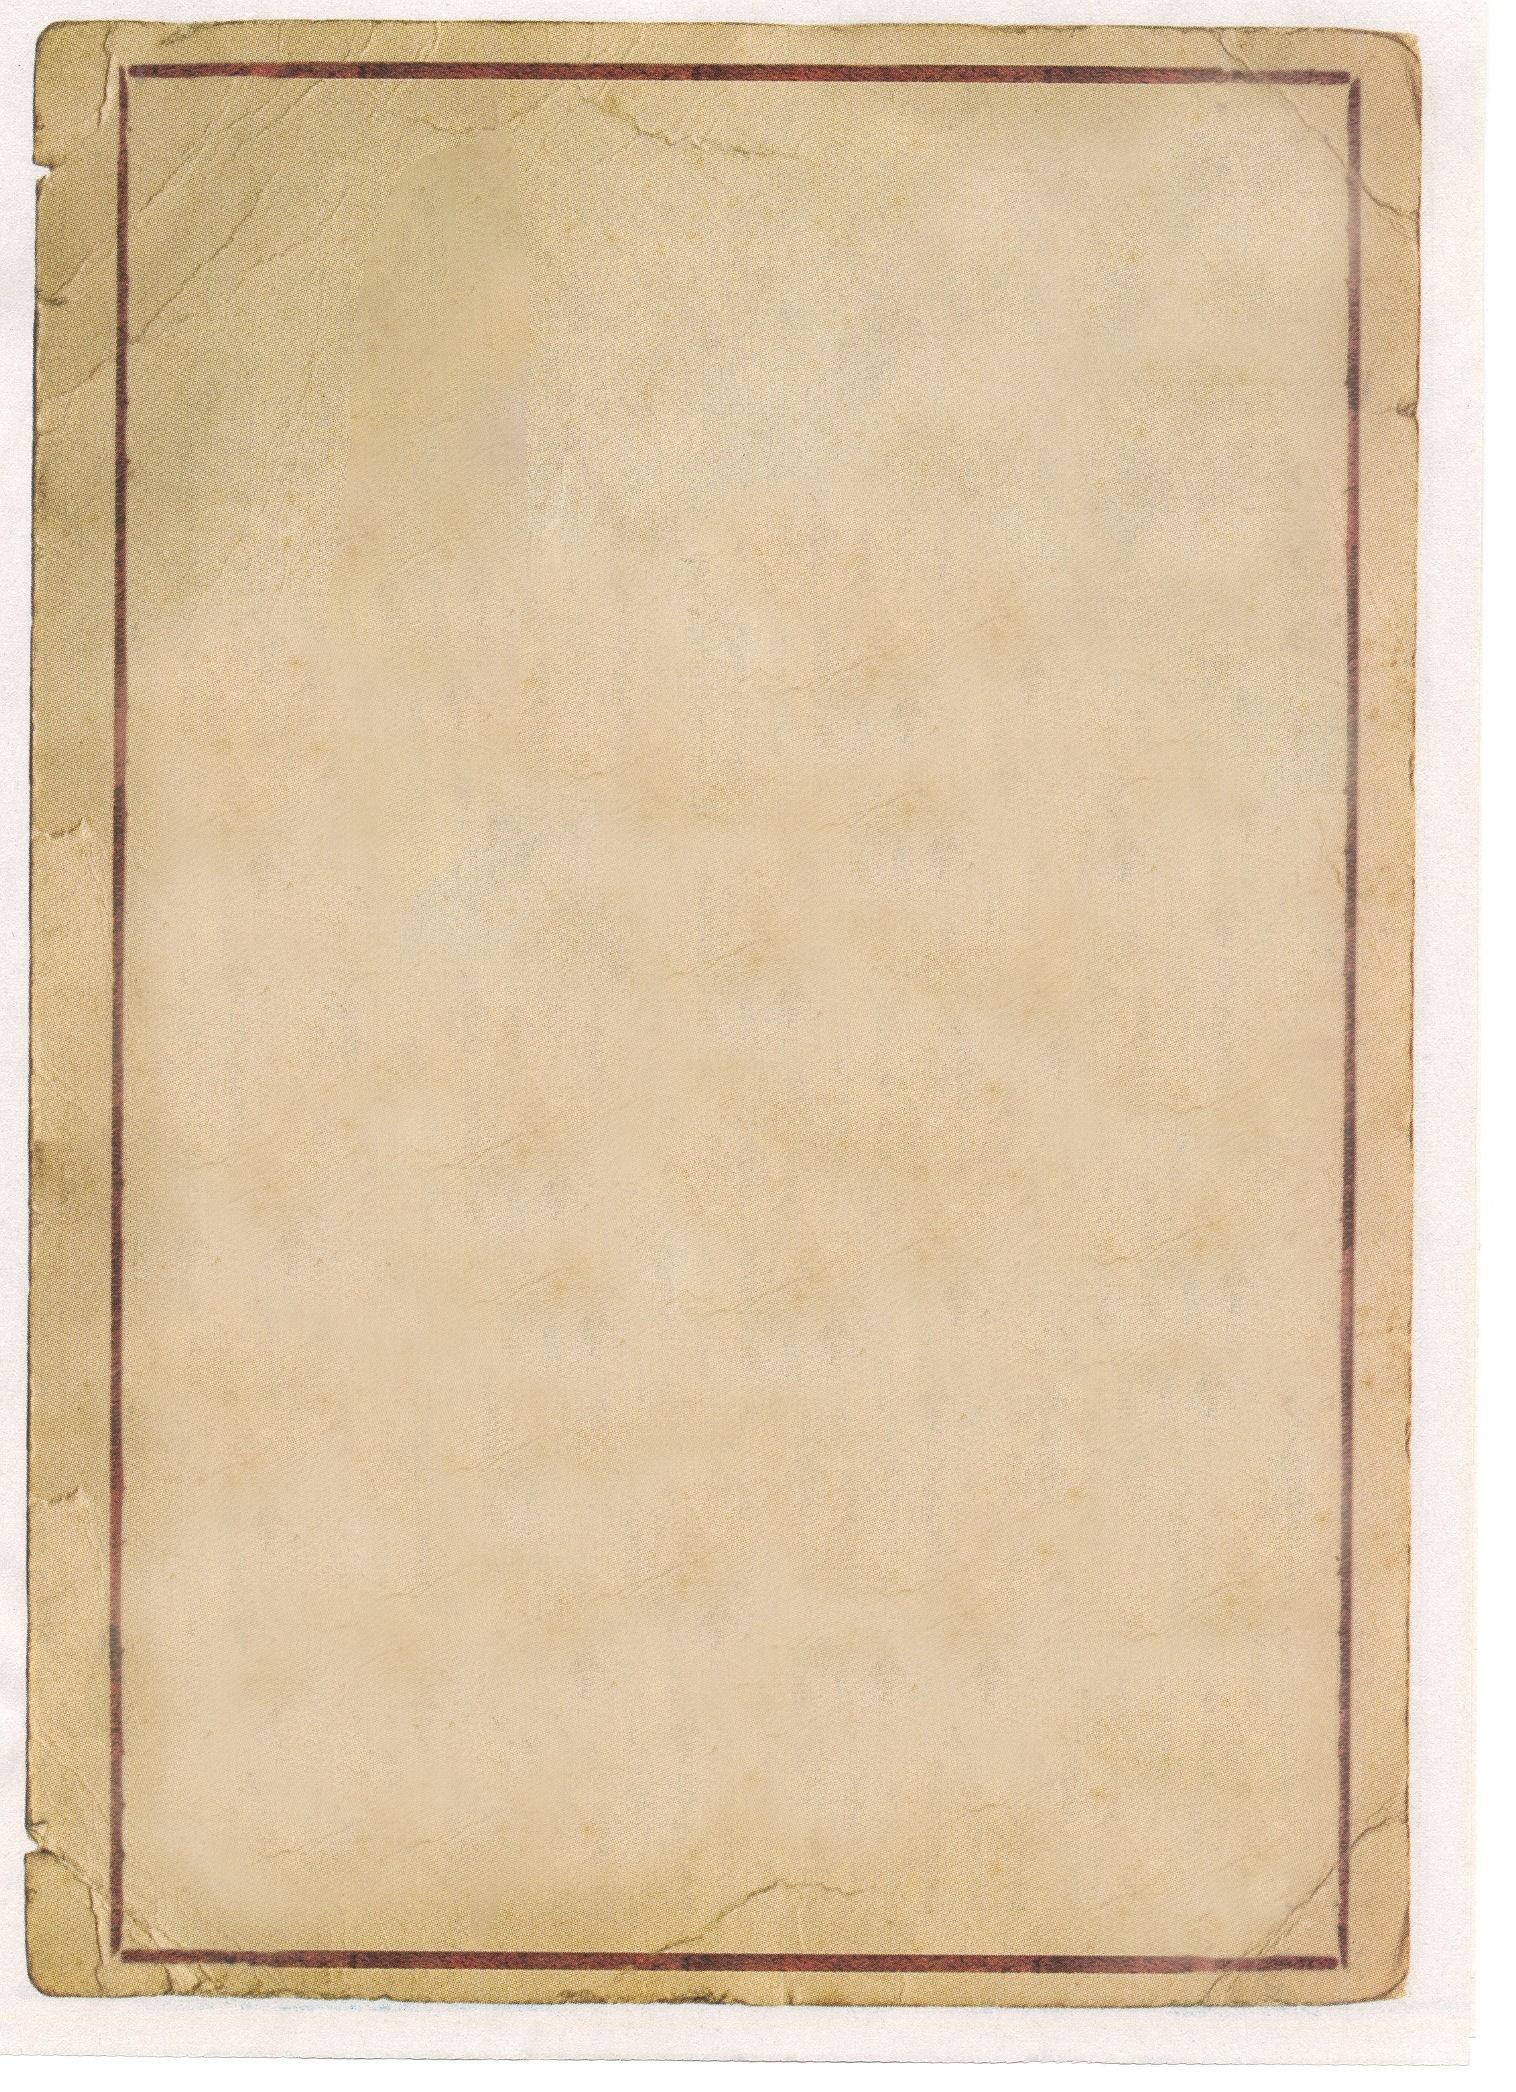 30 Old Paper Textures - t 76